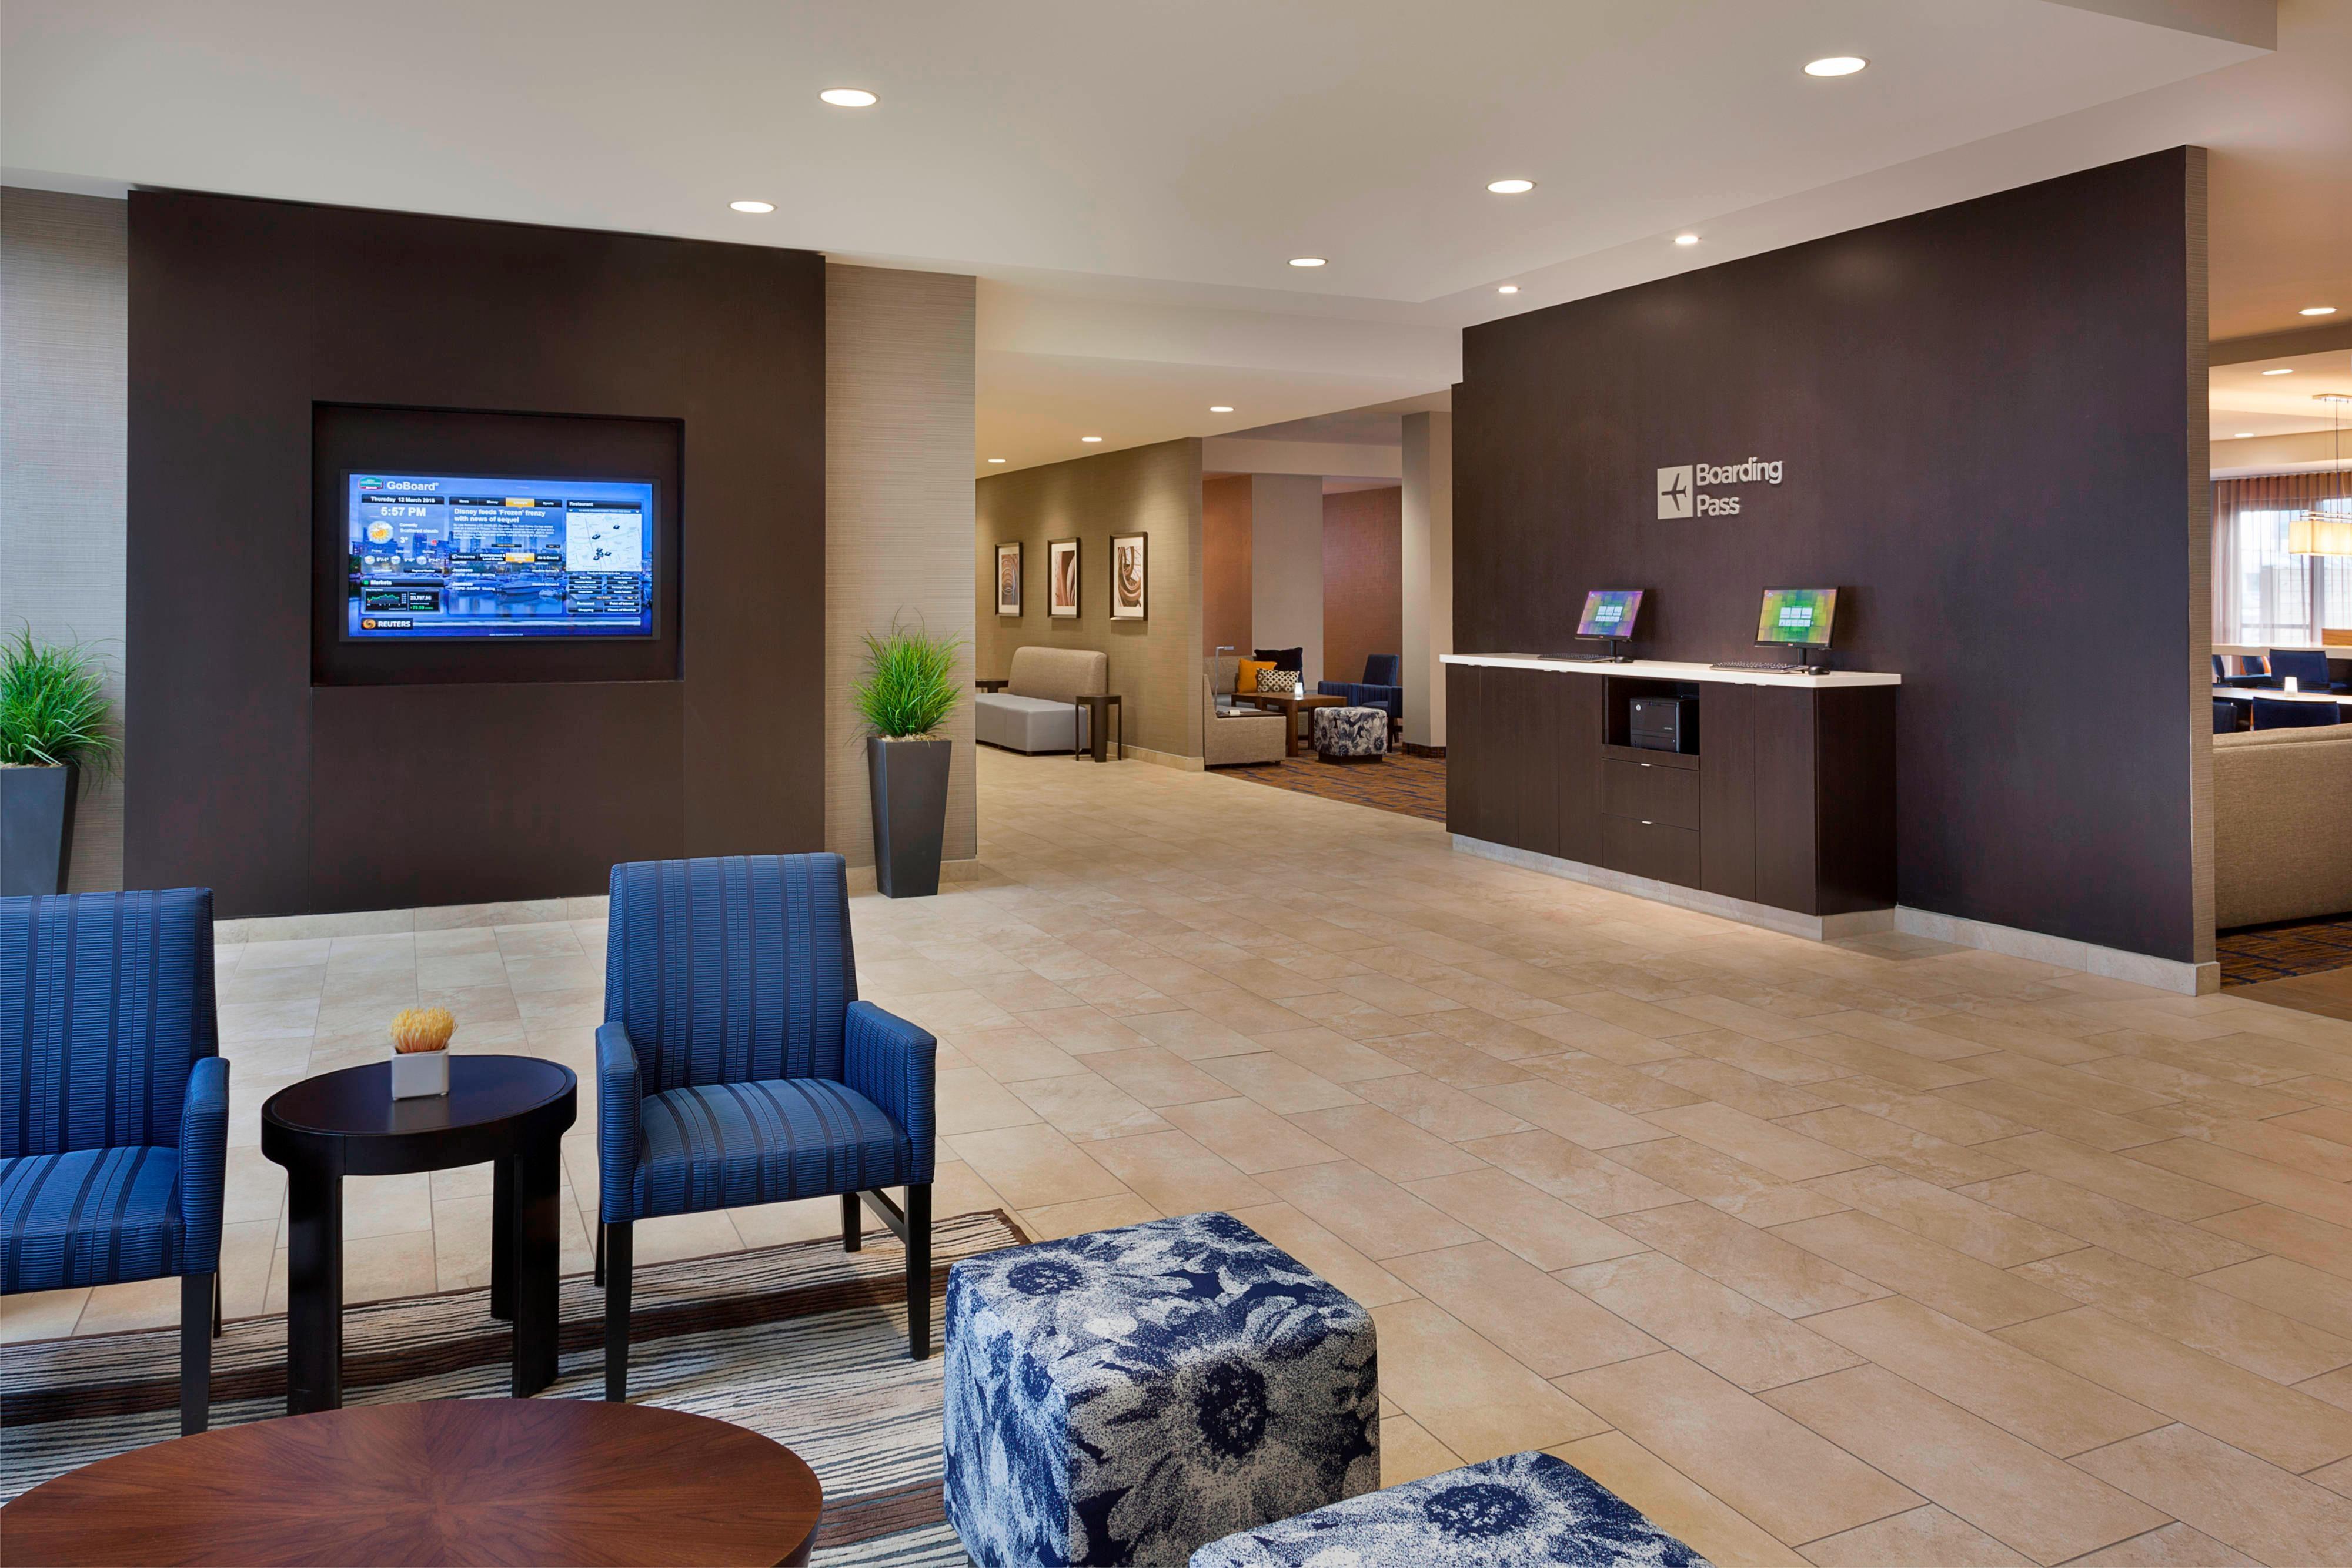 Hotel lobby in Markham Ontario